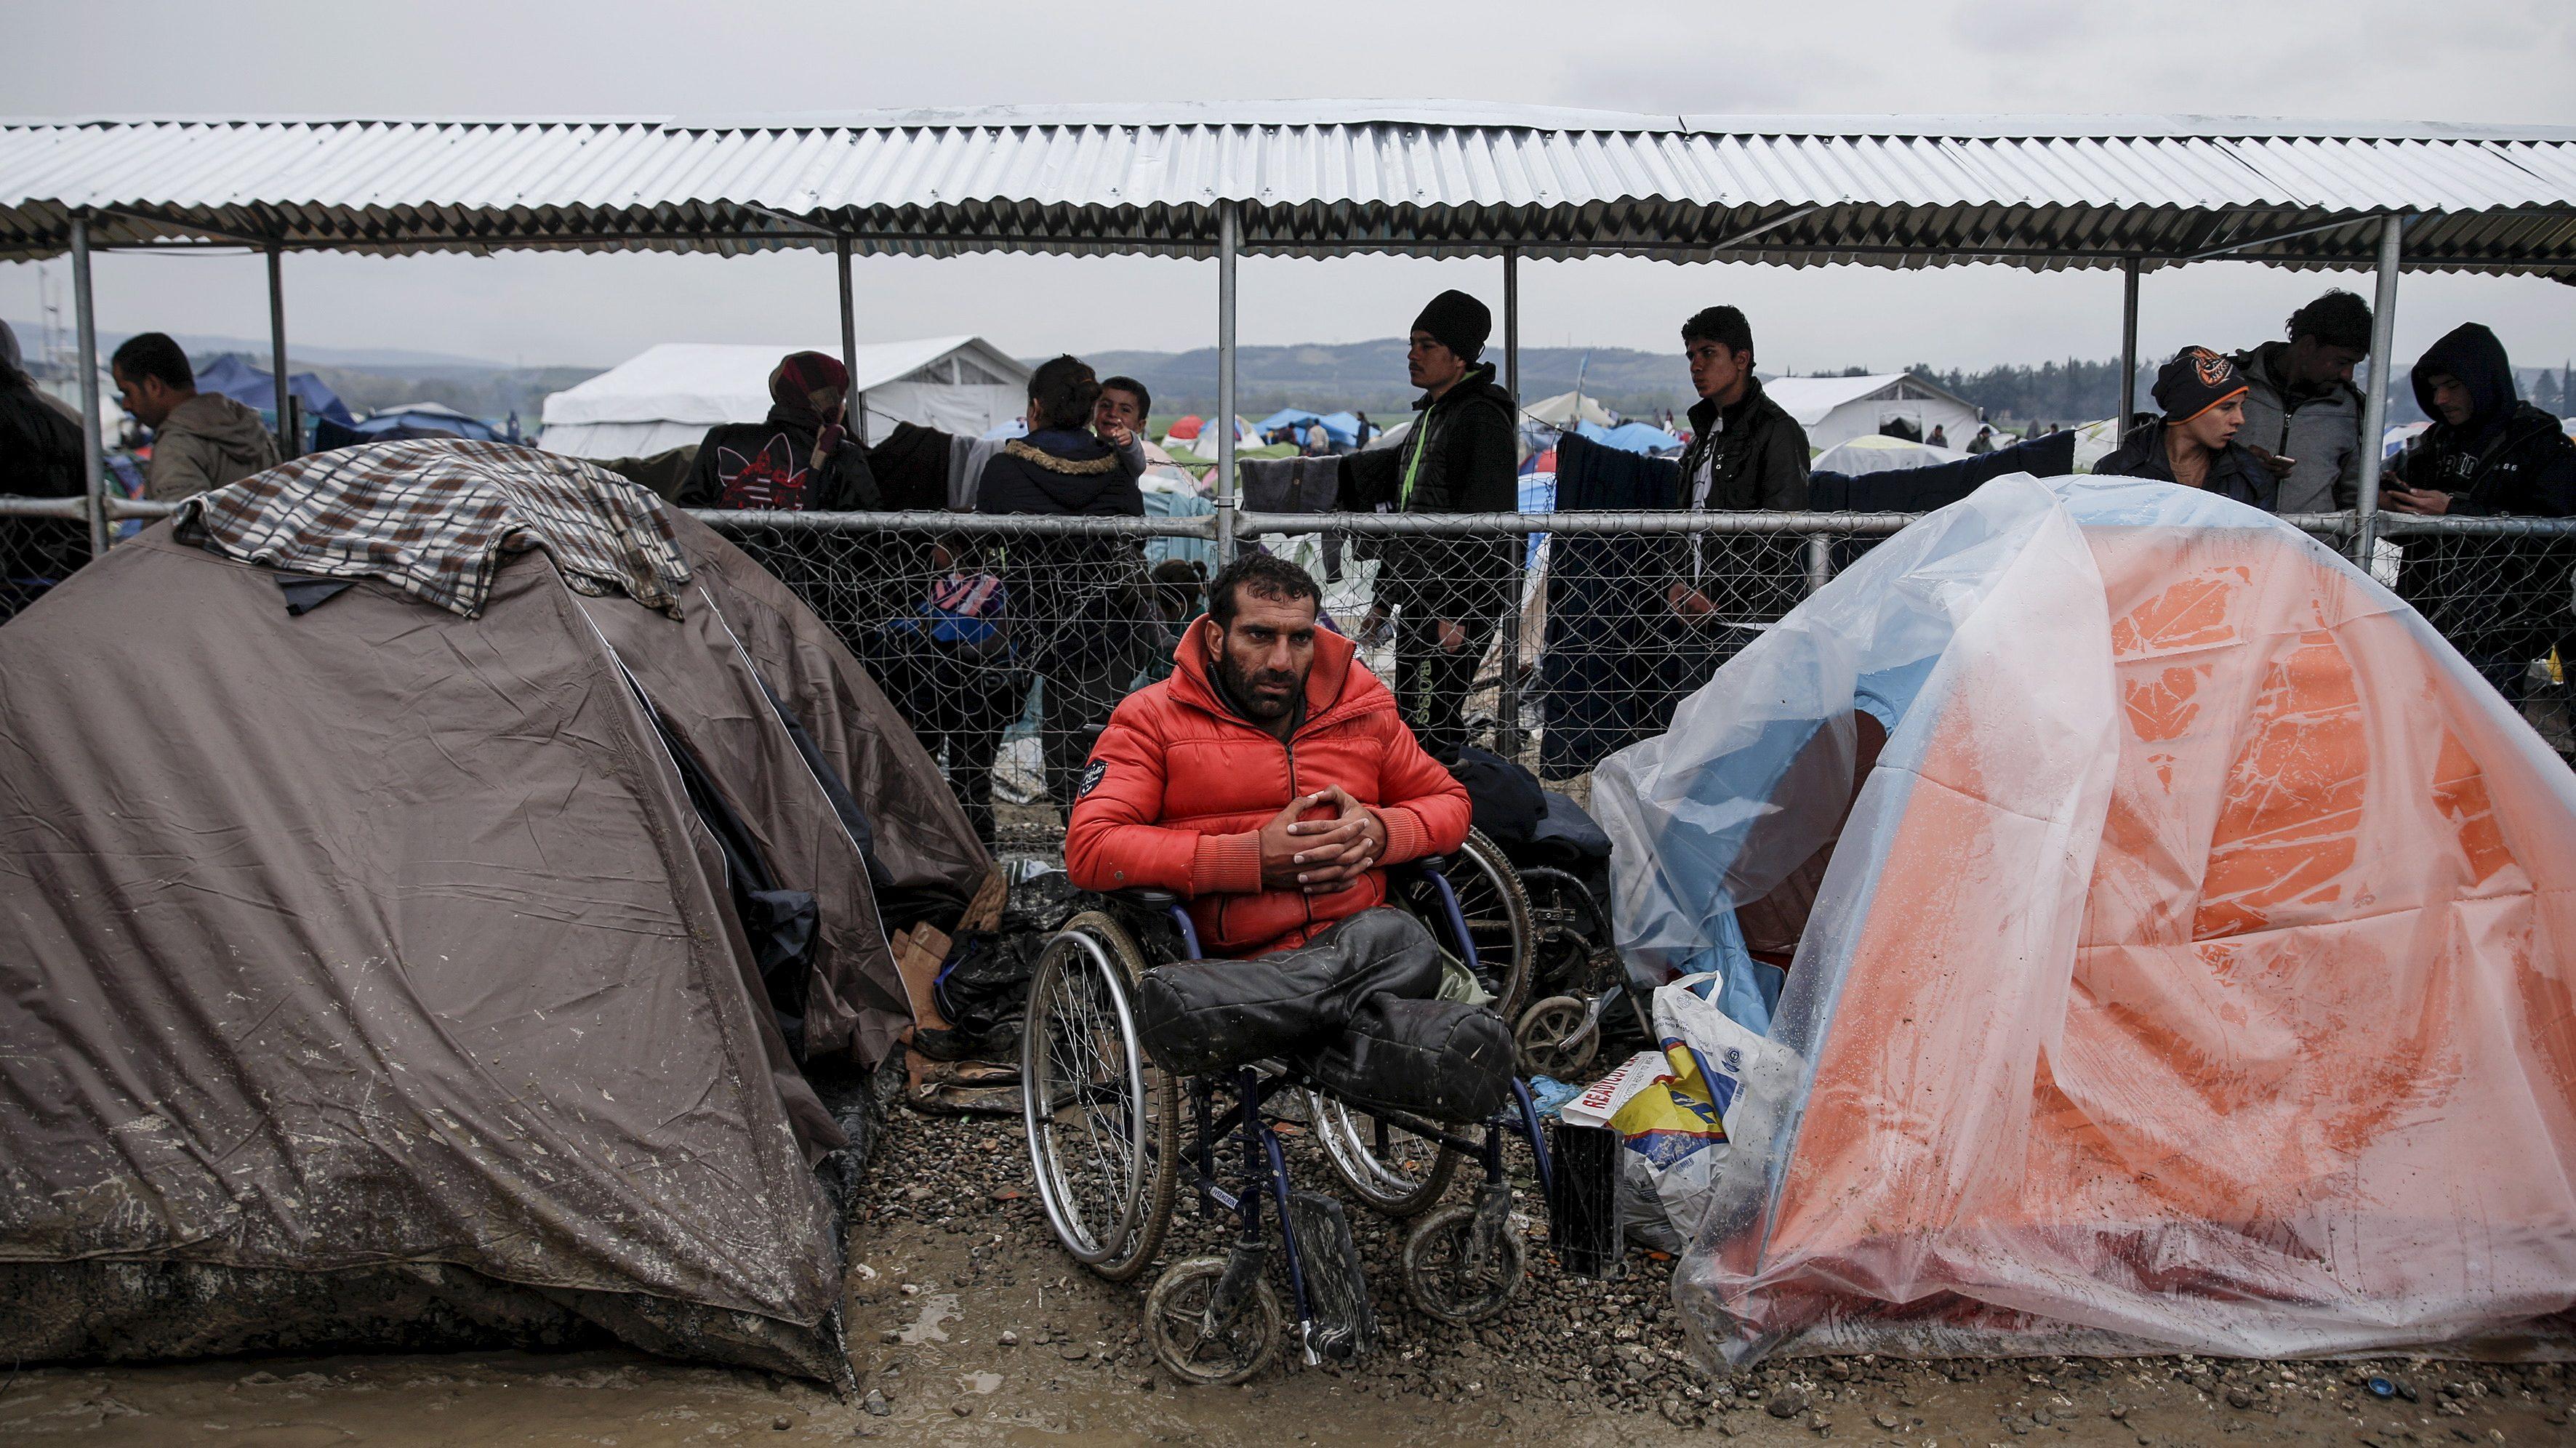 Syrian refugee Radwan Sheikho